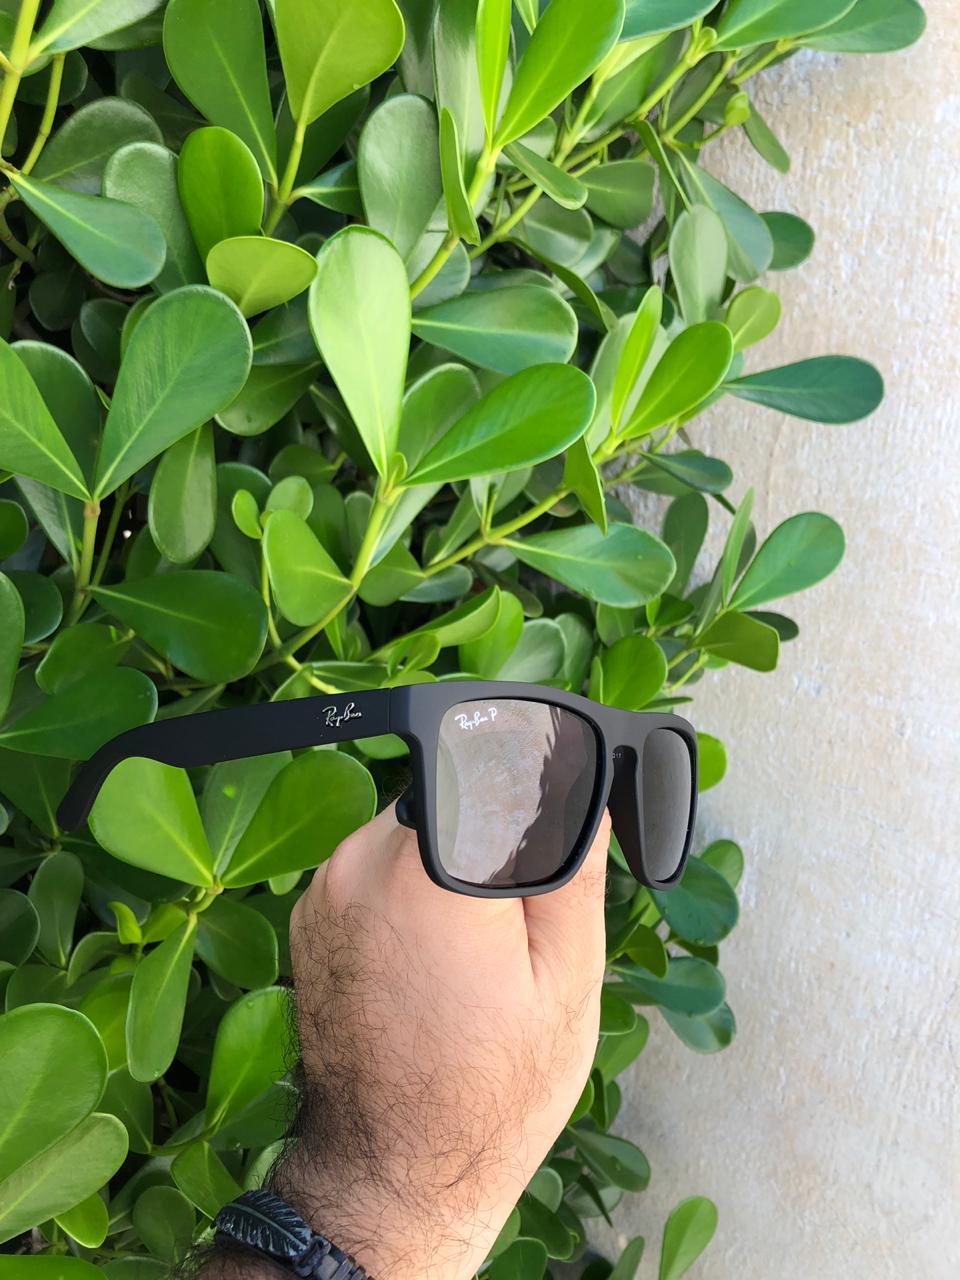 Ray Ban Justin Replica Oculos Primeira Linha